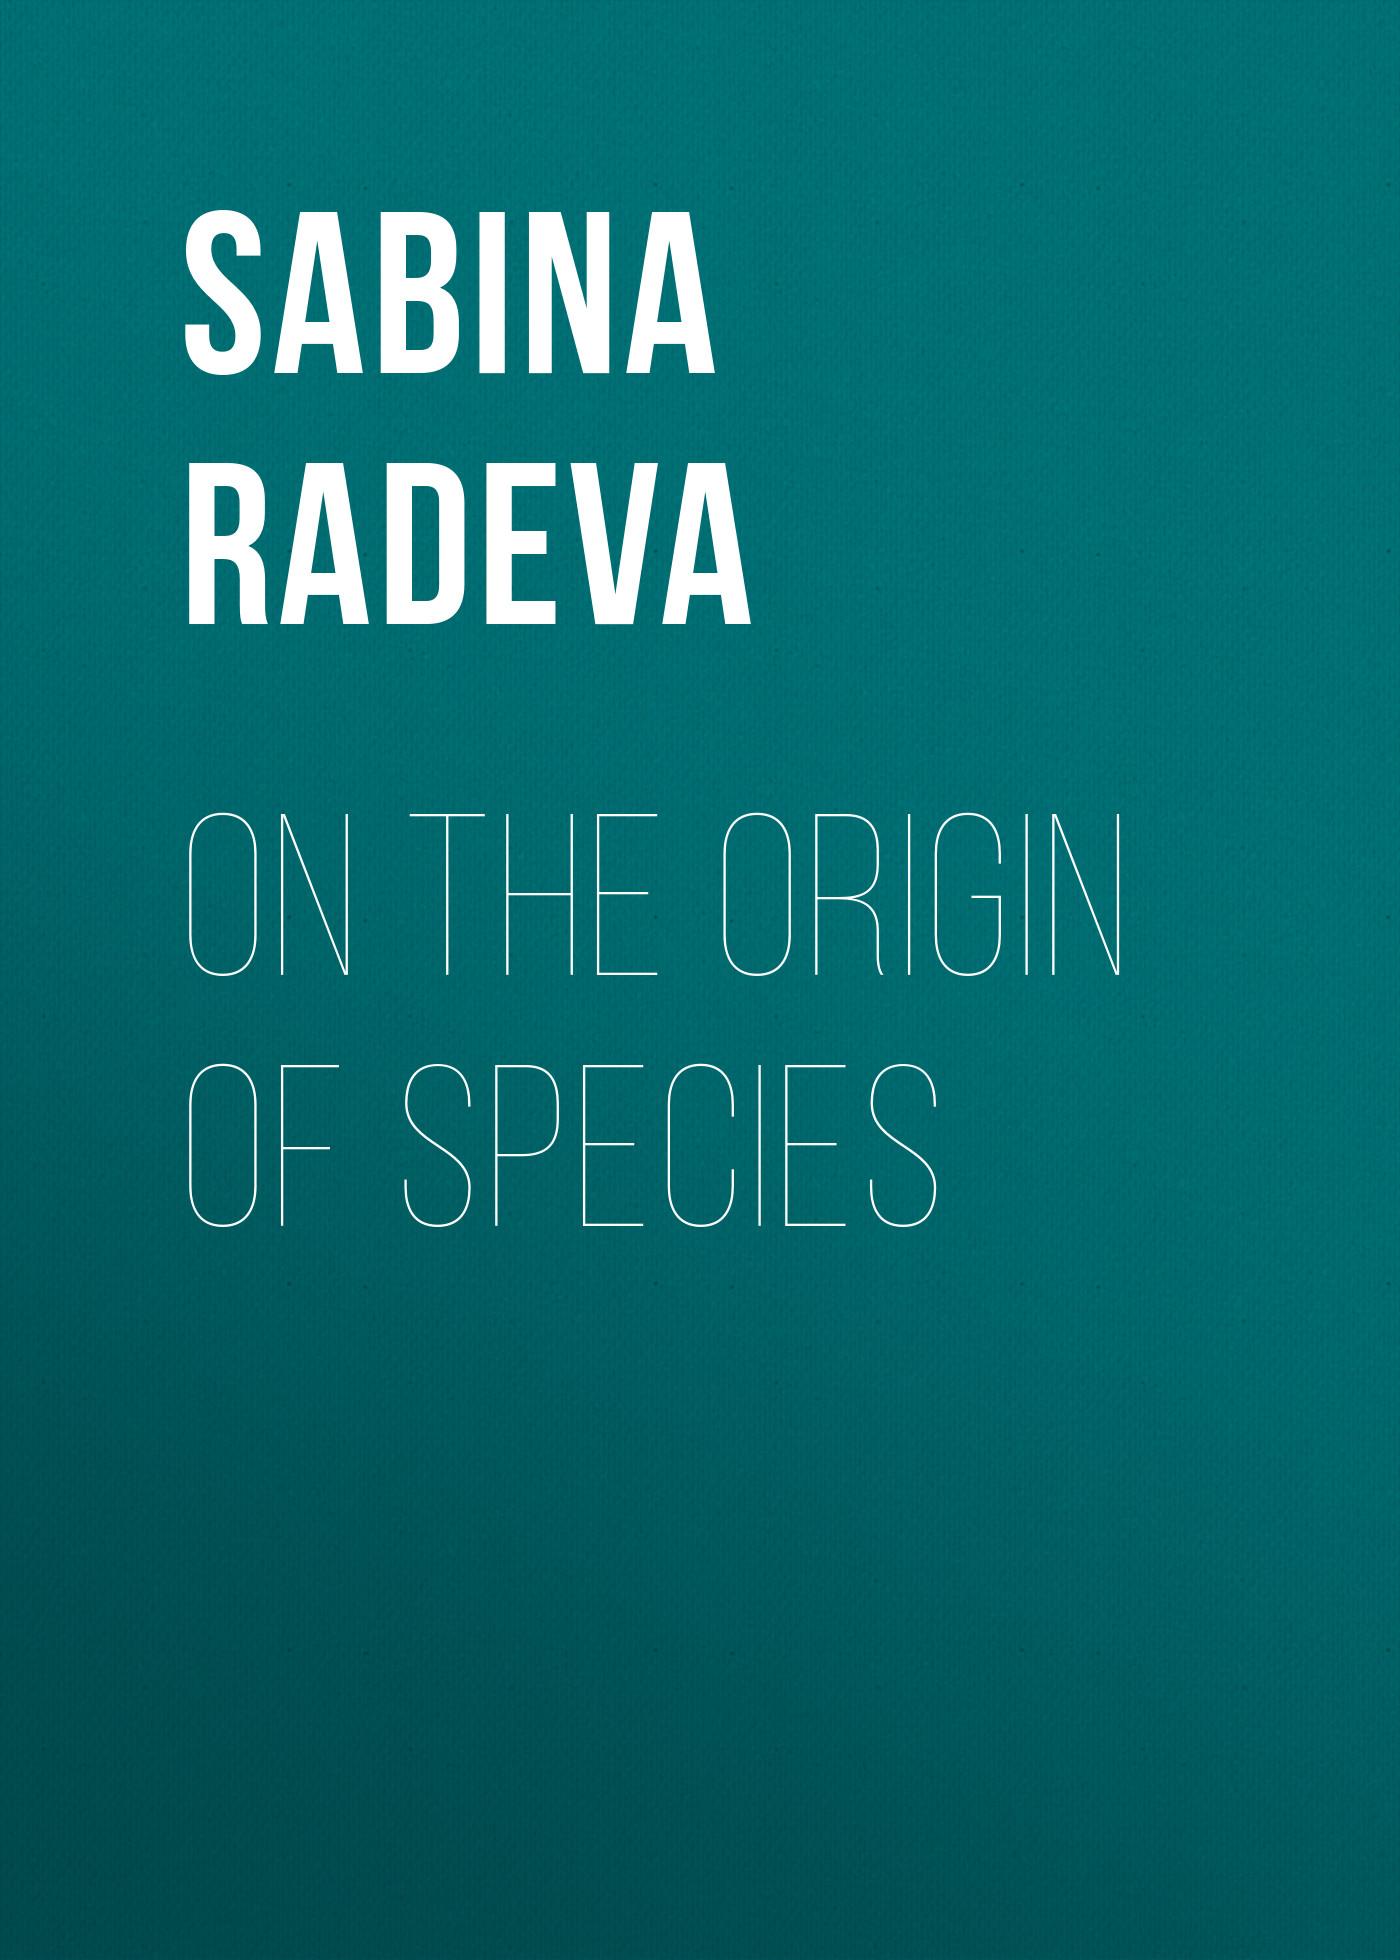 Sabina Radeva On The Origin of Species on the origin of species